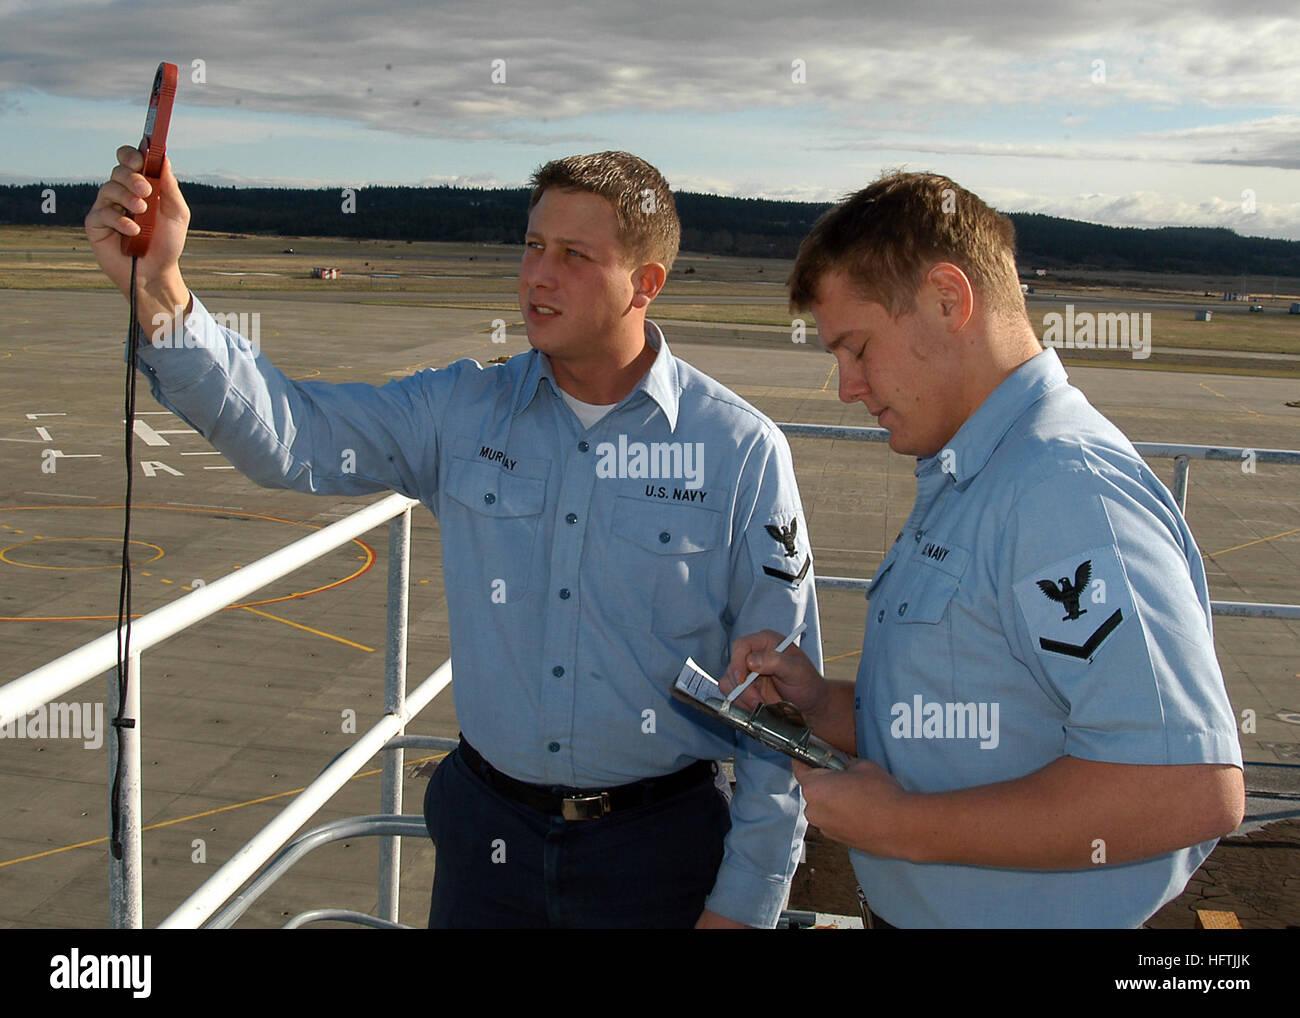 070327-N-6247M-011 Oak Harbor, Washington (27 mars 2007) -'Aérographe 4400 3 classe Bryan Murray, l'aérographe Photo Stock